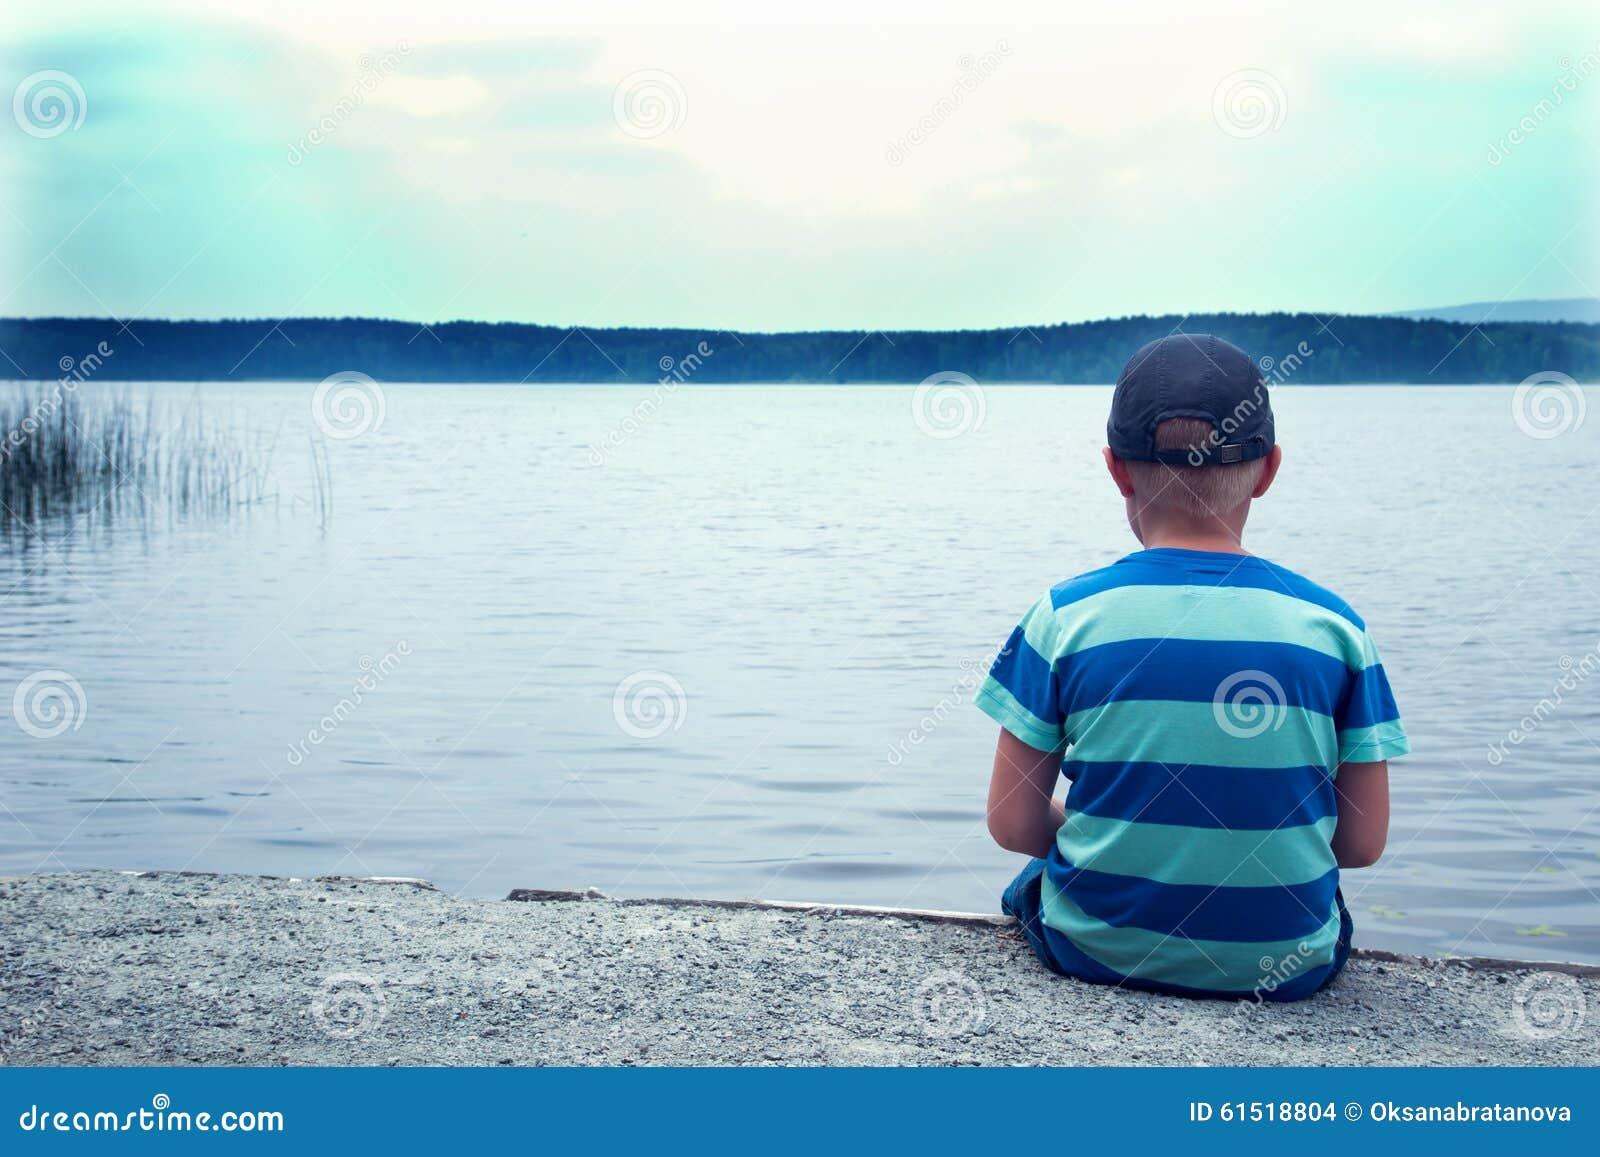 Group Of Sad Boy Sitting Alone